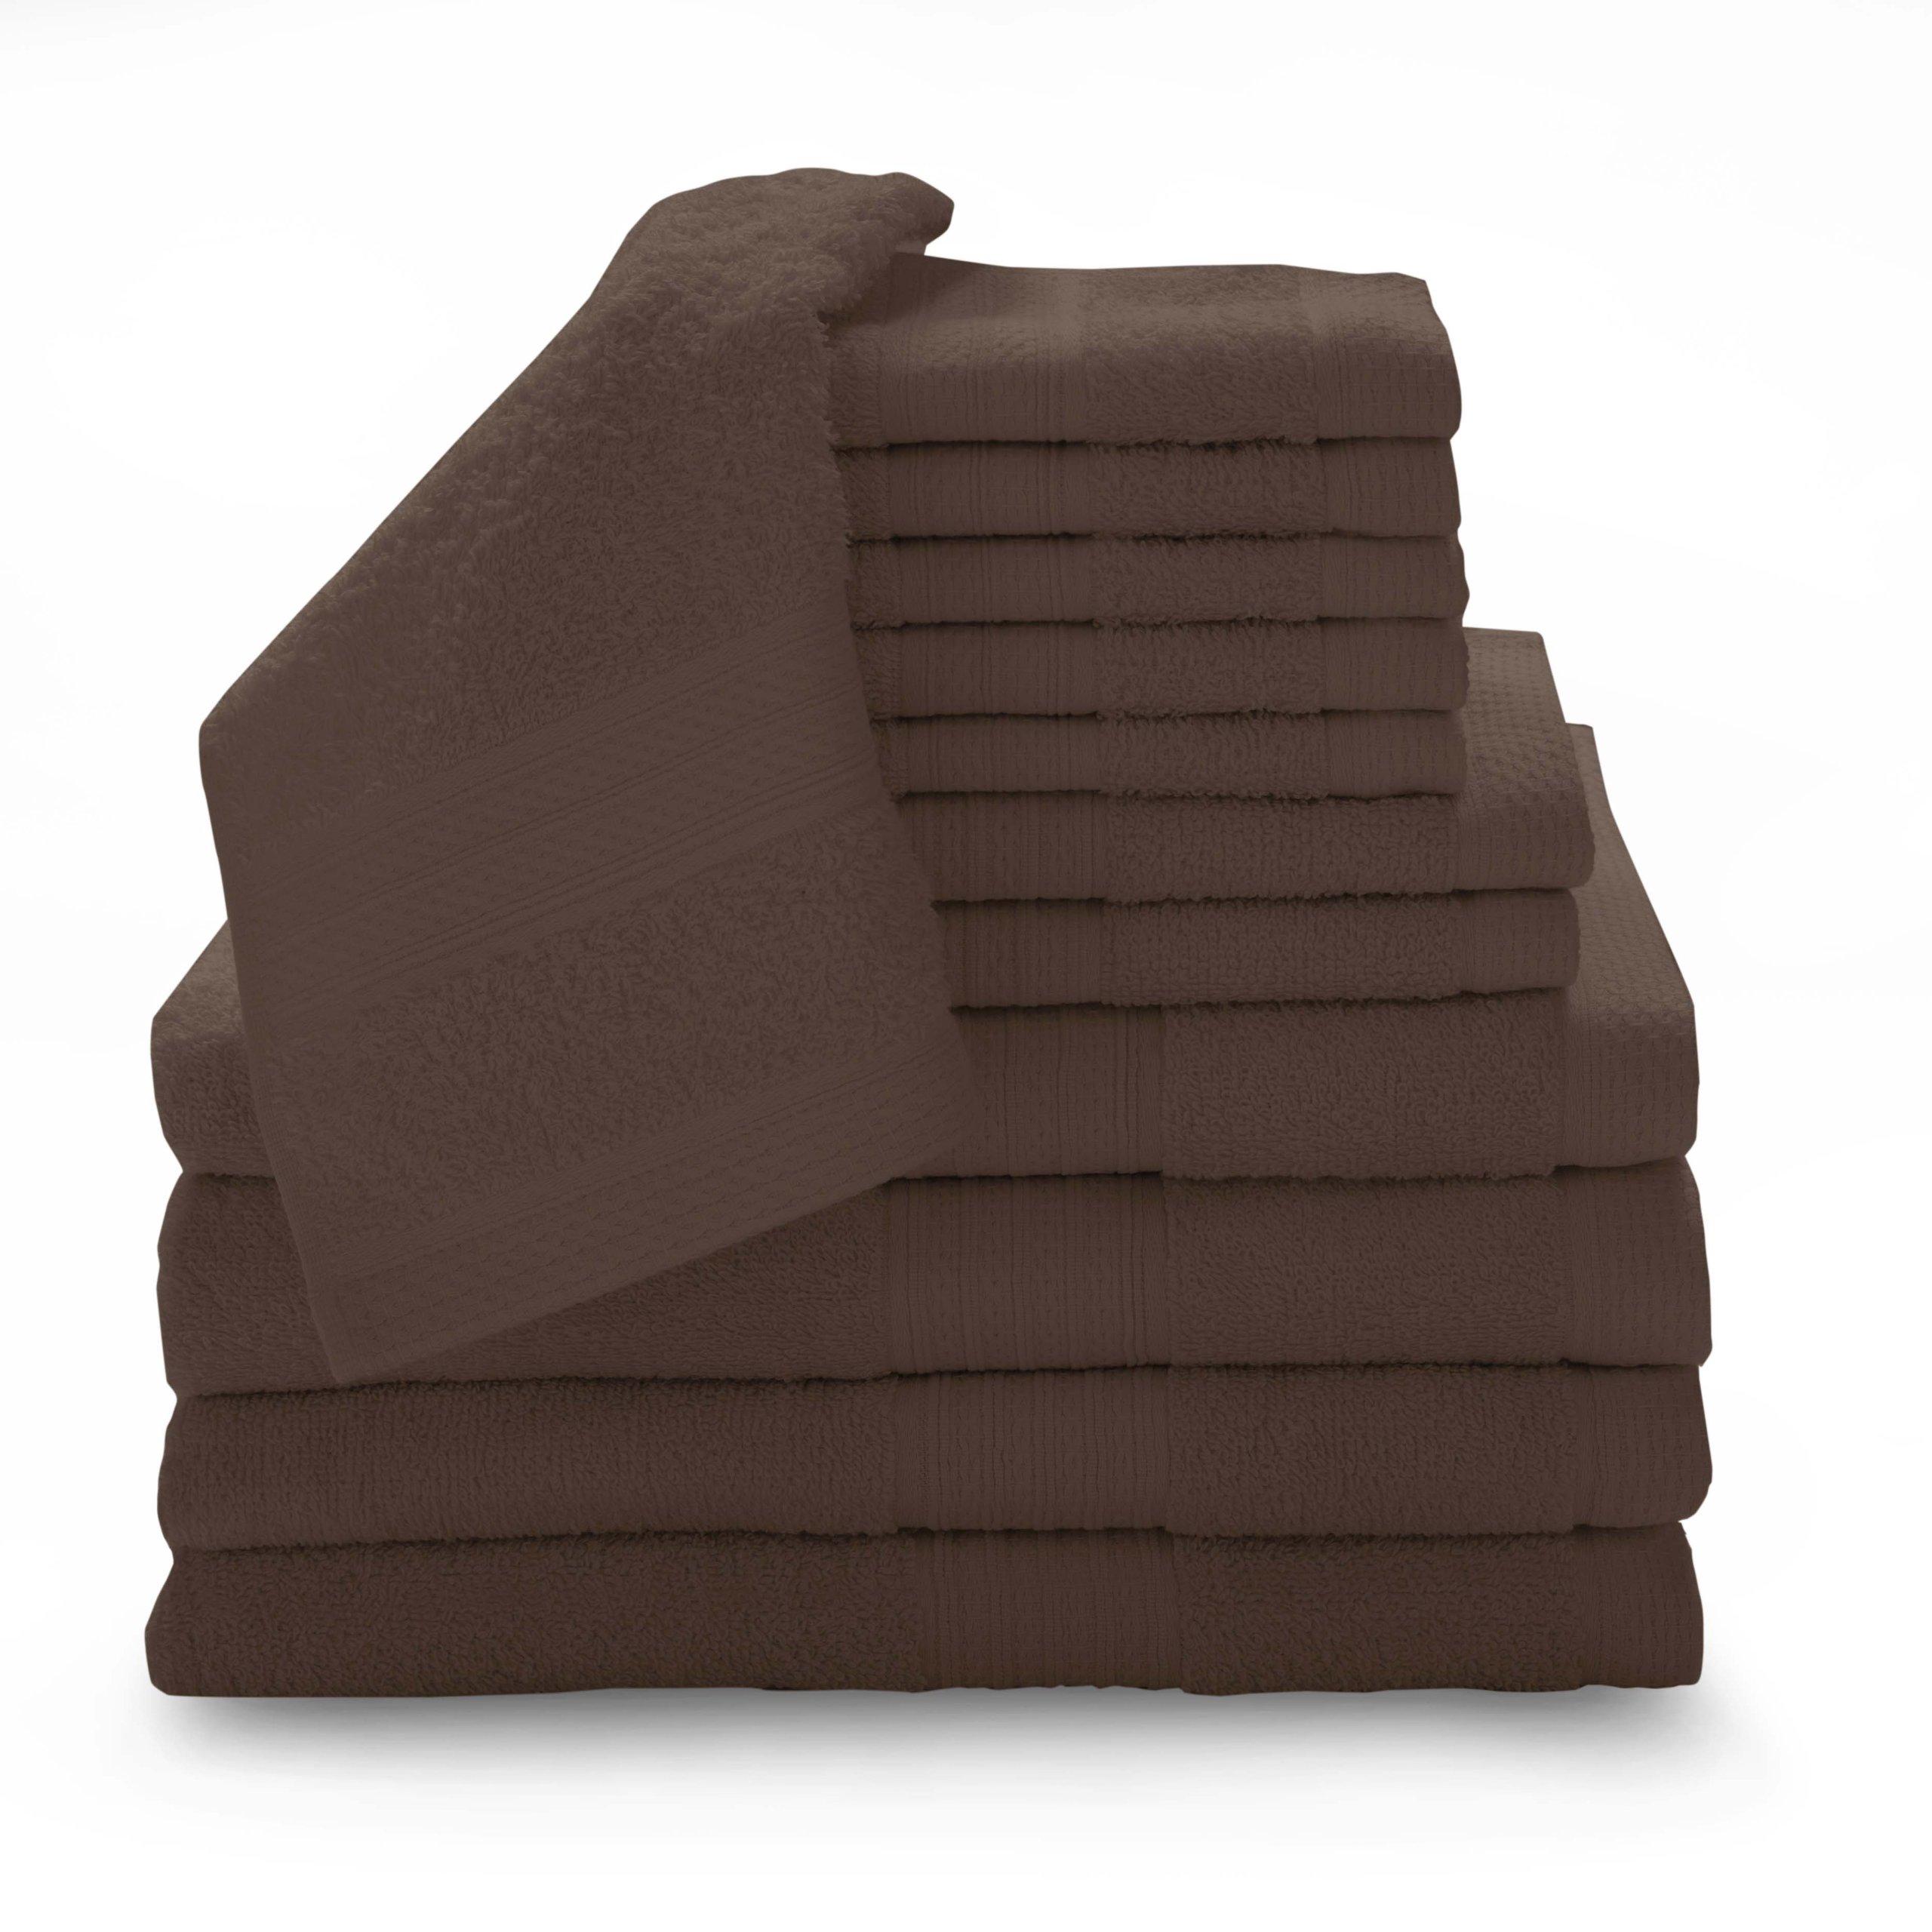 BALTIC LINEN COMPANY 100-Percent Cotton Luxury 12-Piece Towel Set, Espresso